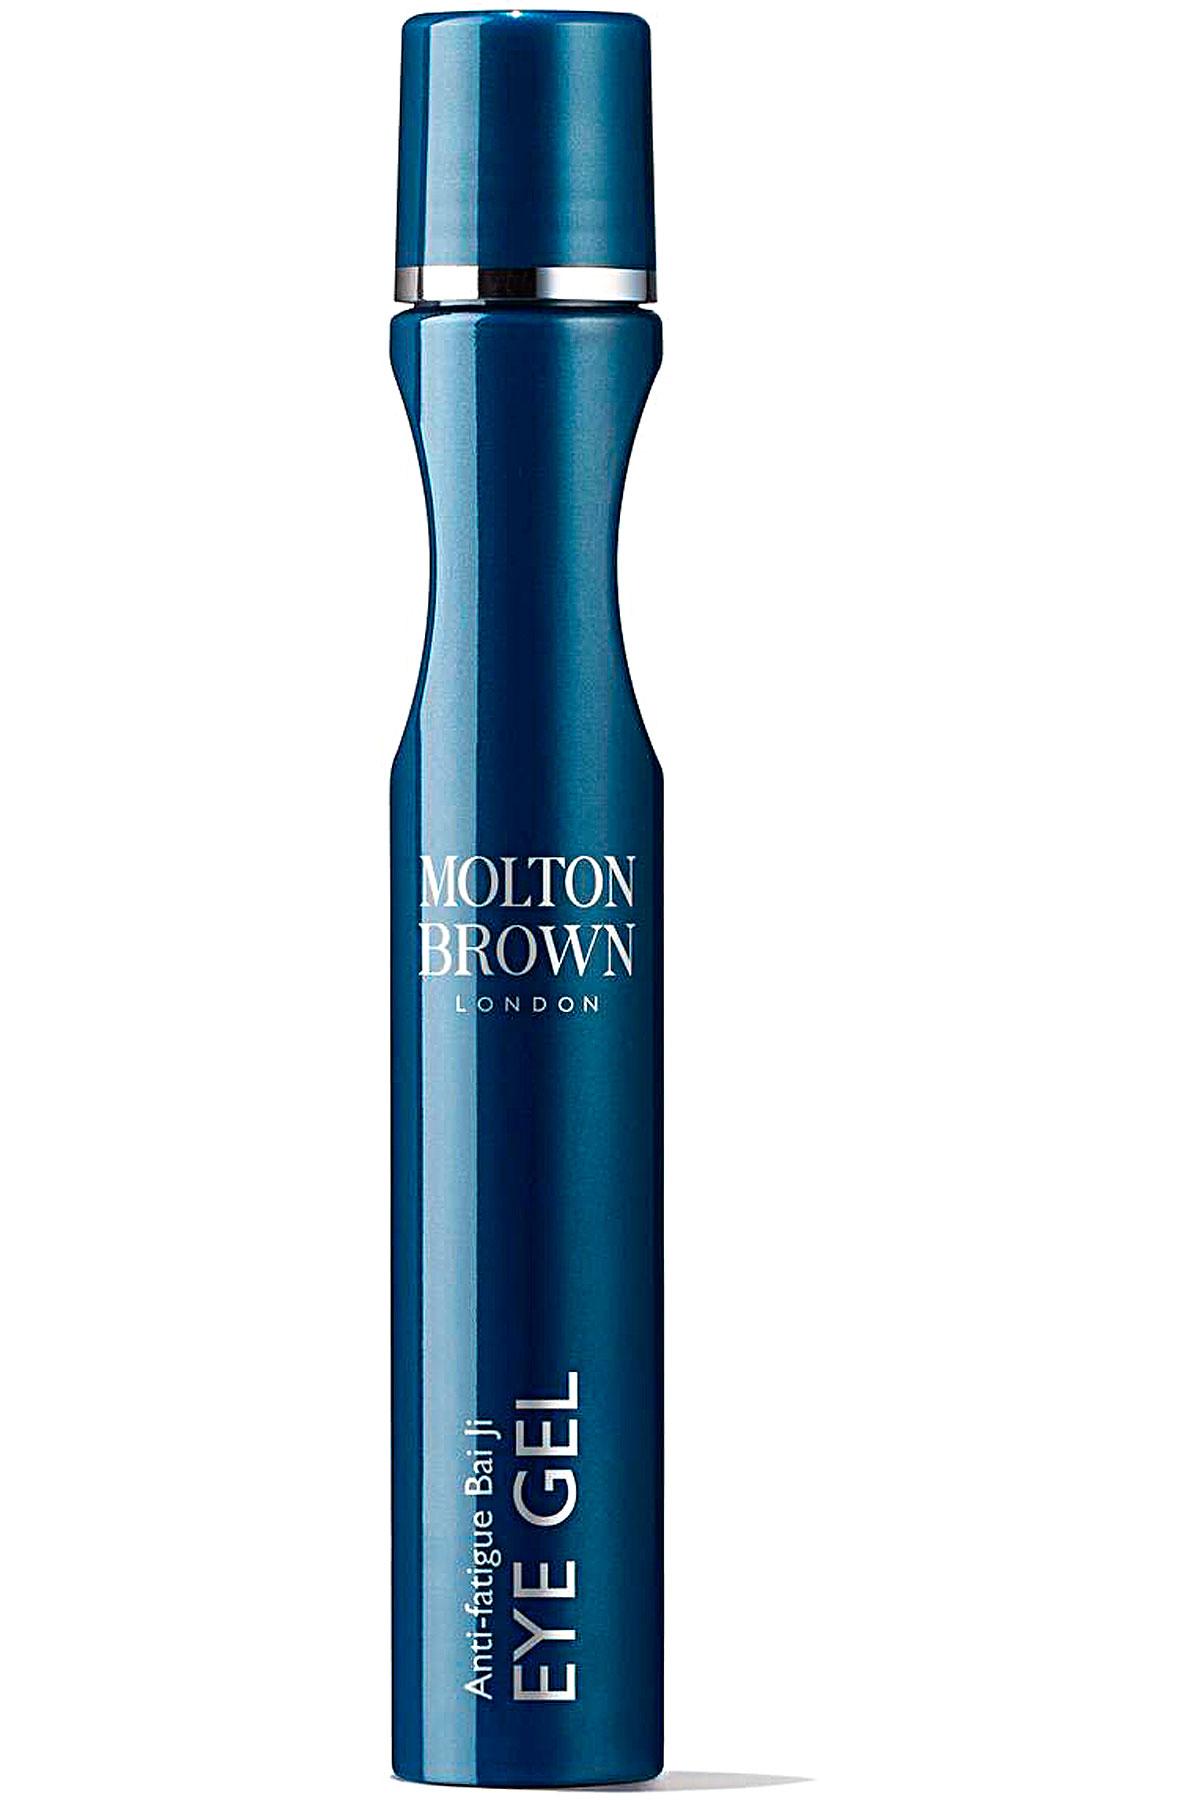 Molton Brown Beauty for Men, Anti-fatigue Bai Ji Eye Gel - 15 Ml, 2019, 15 ml